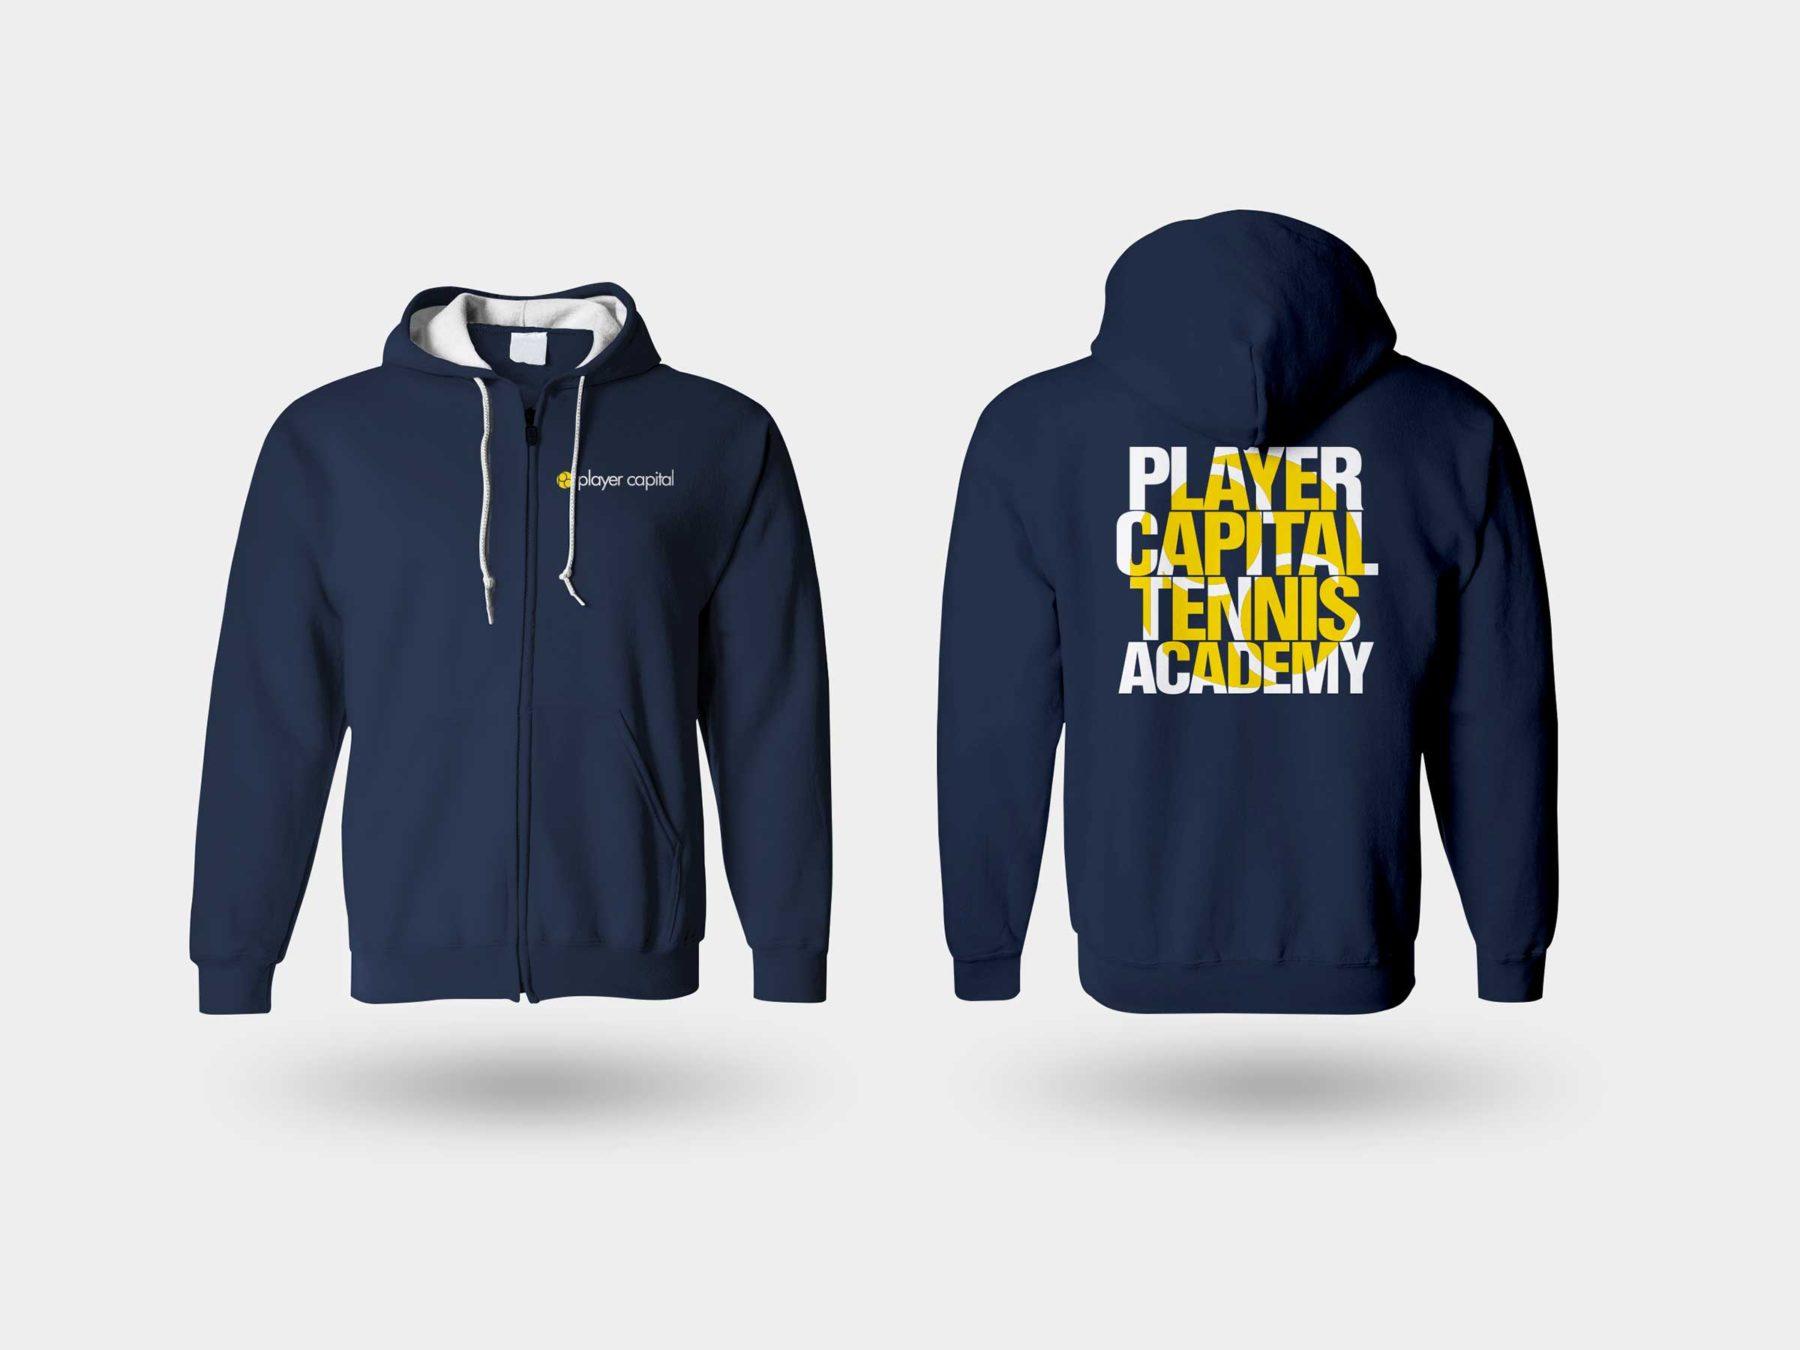 Player Capital Tennis Sweatshirt Design